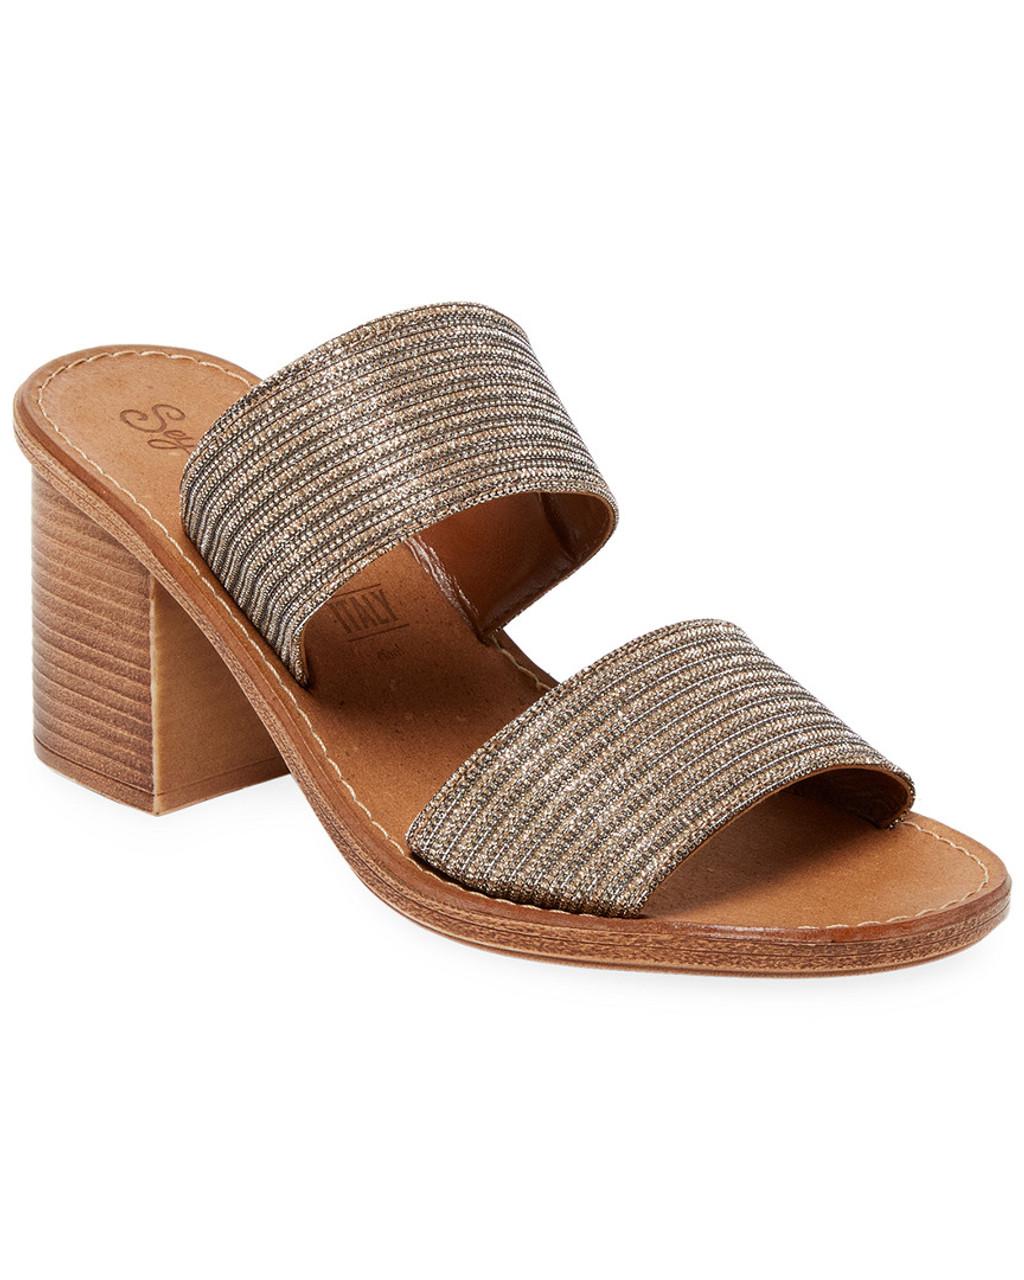 193ef78186 Seychelles No Holds Barred Banded Sandal~1311801542 - Carsons